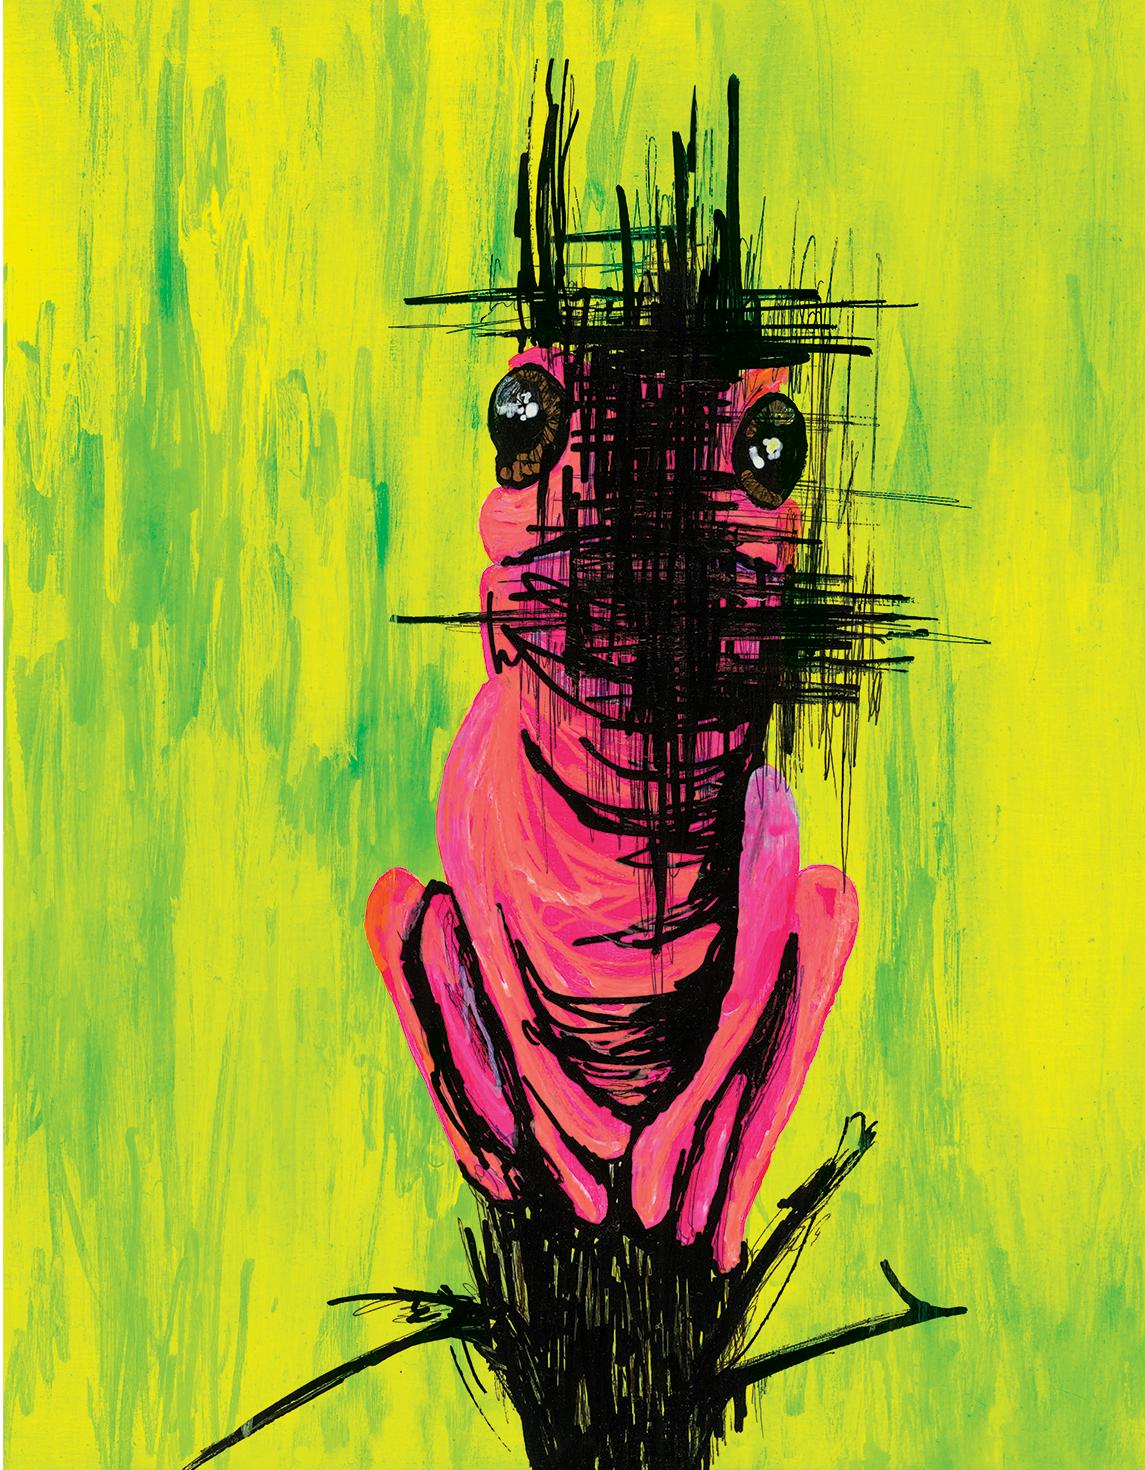 "Oophaga 11"" x 14"" unframed hand embellished print"